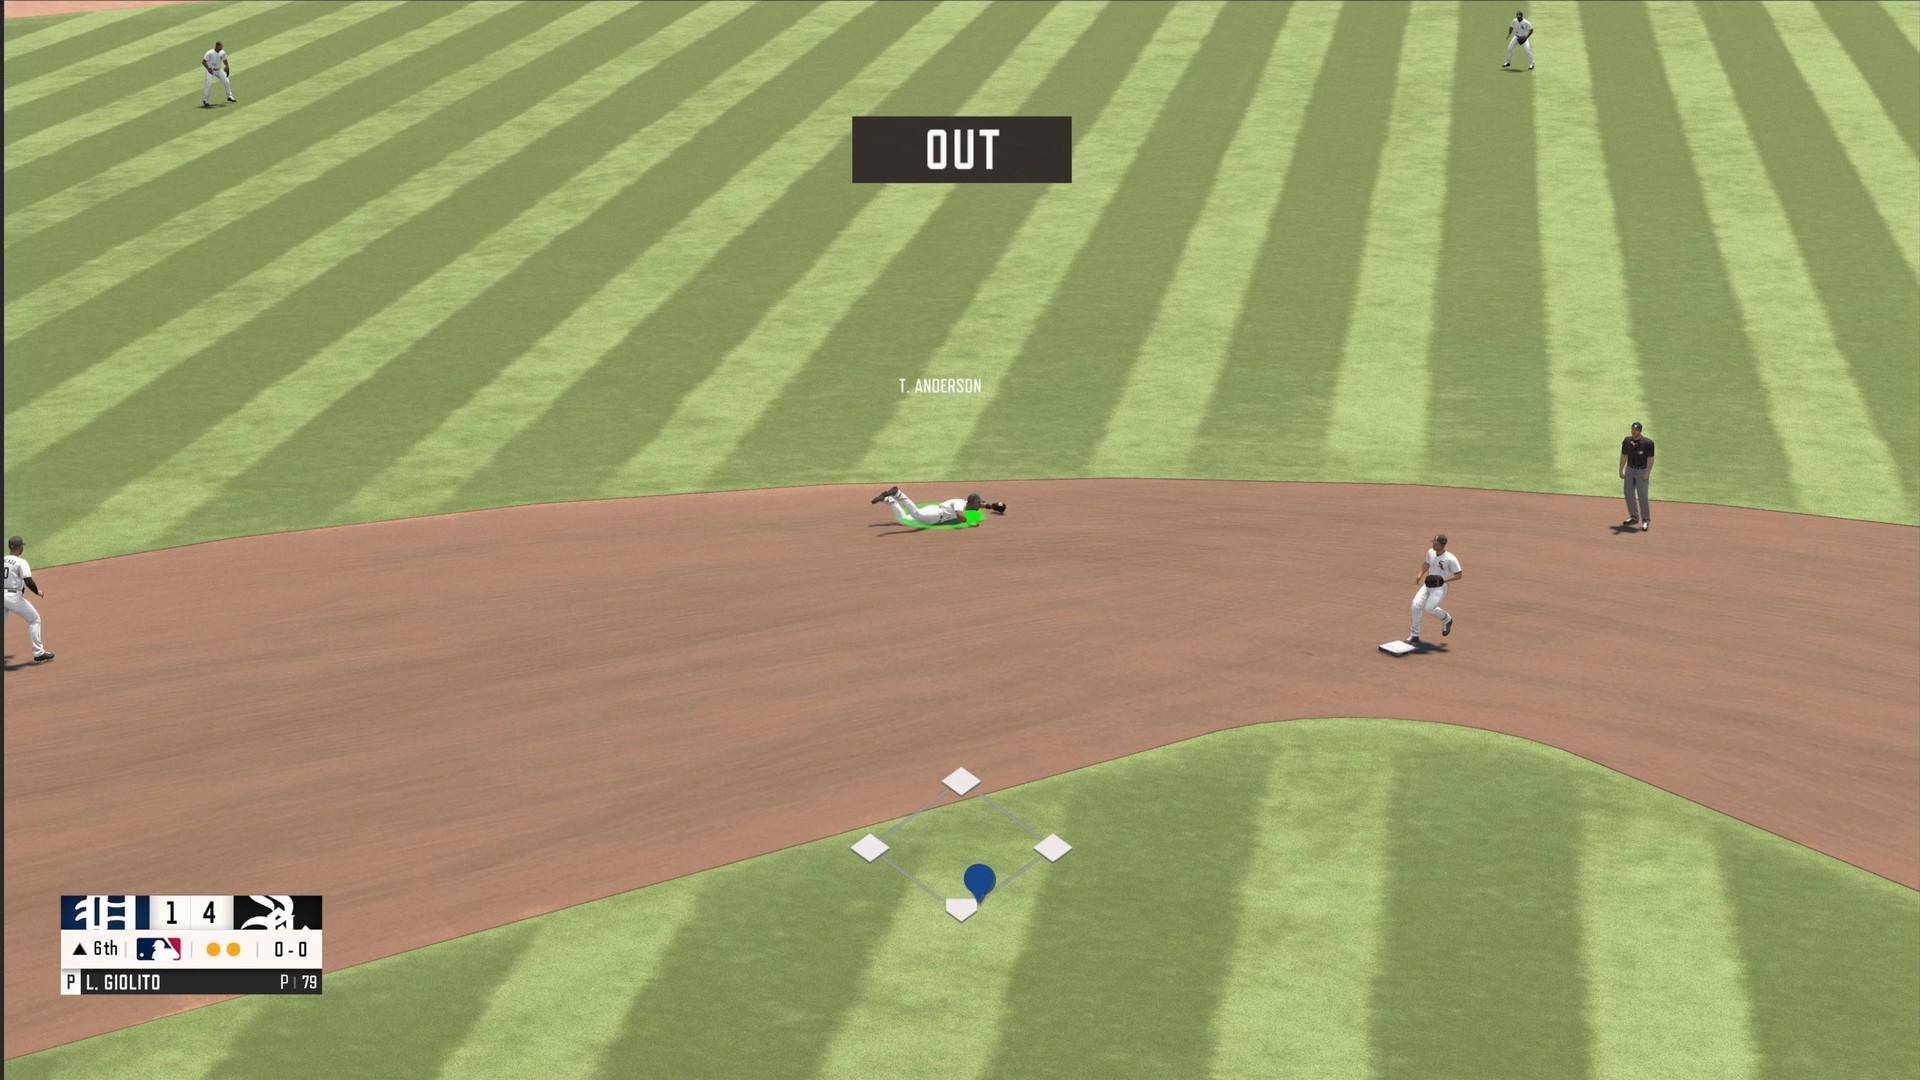 rbi-baseball-21-pc-screenshot-3